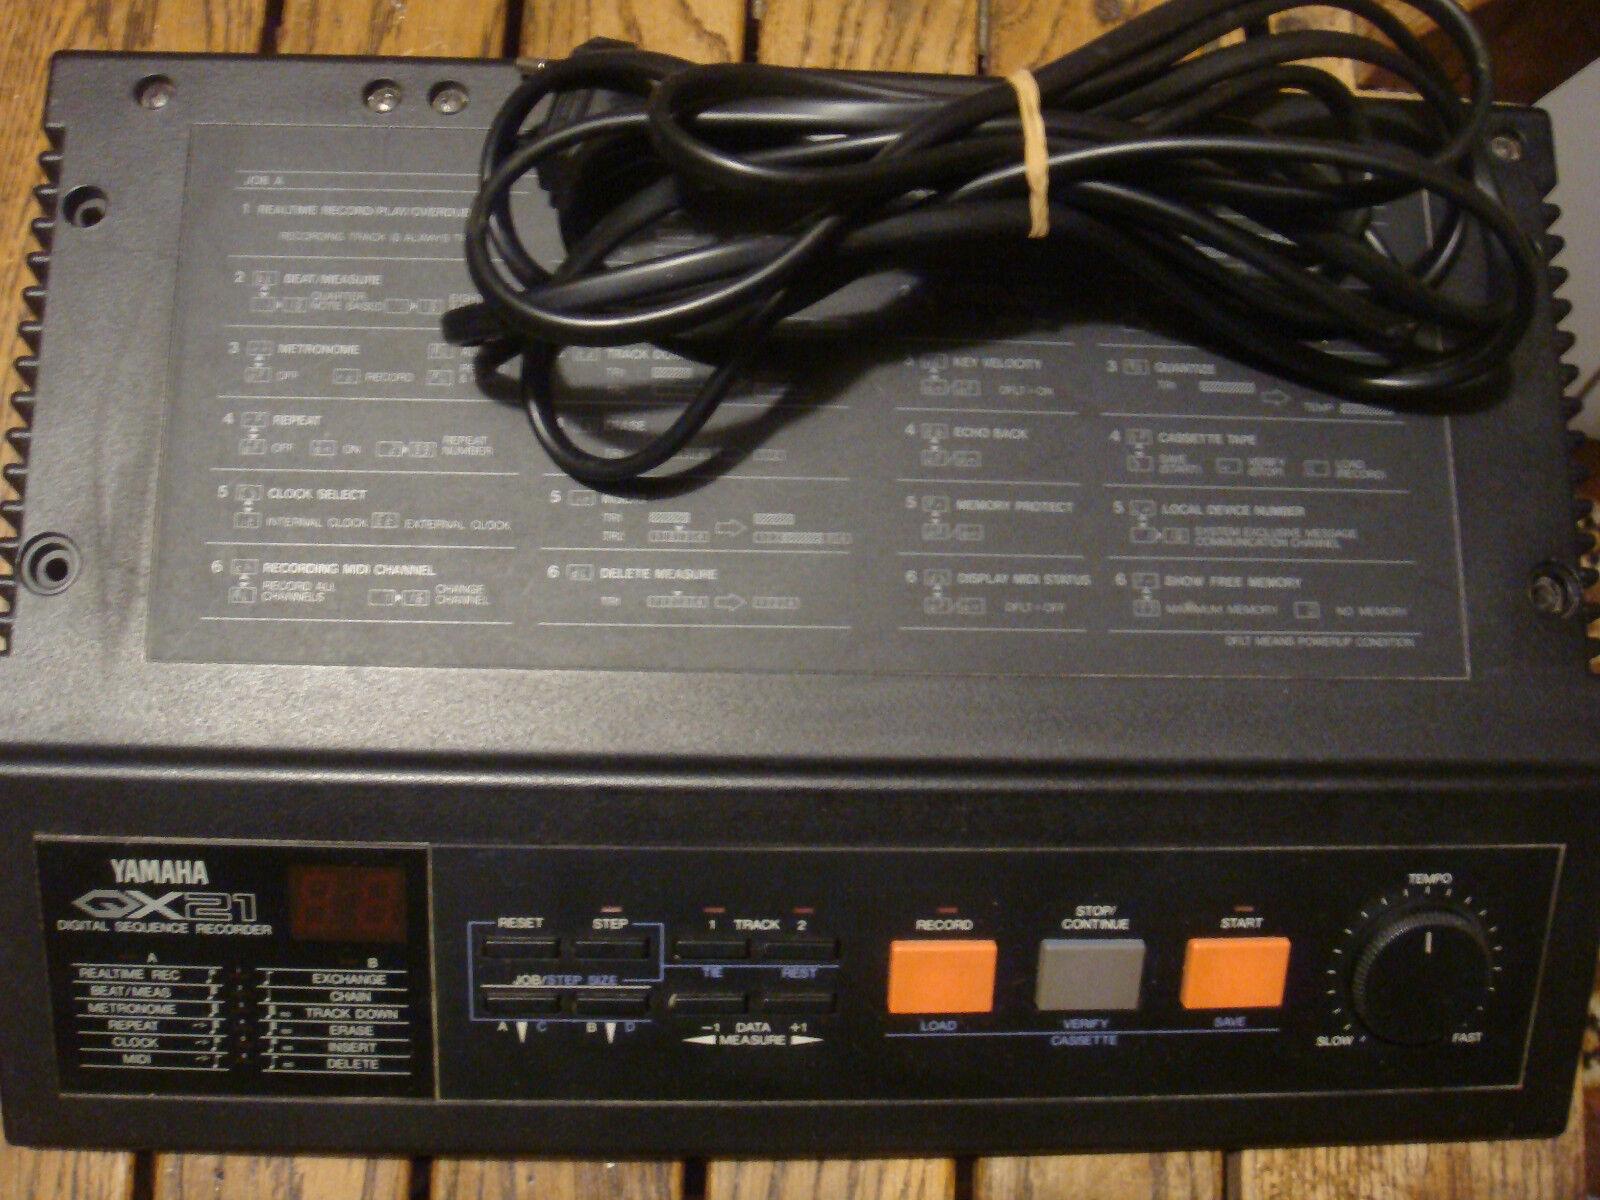 Yamaha QX21 Digital Sequence Recorder Vintage MIDI Rekorder Sequencer Aufnahme